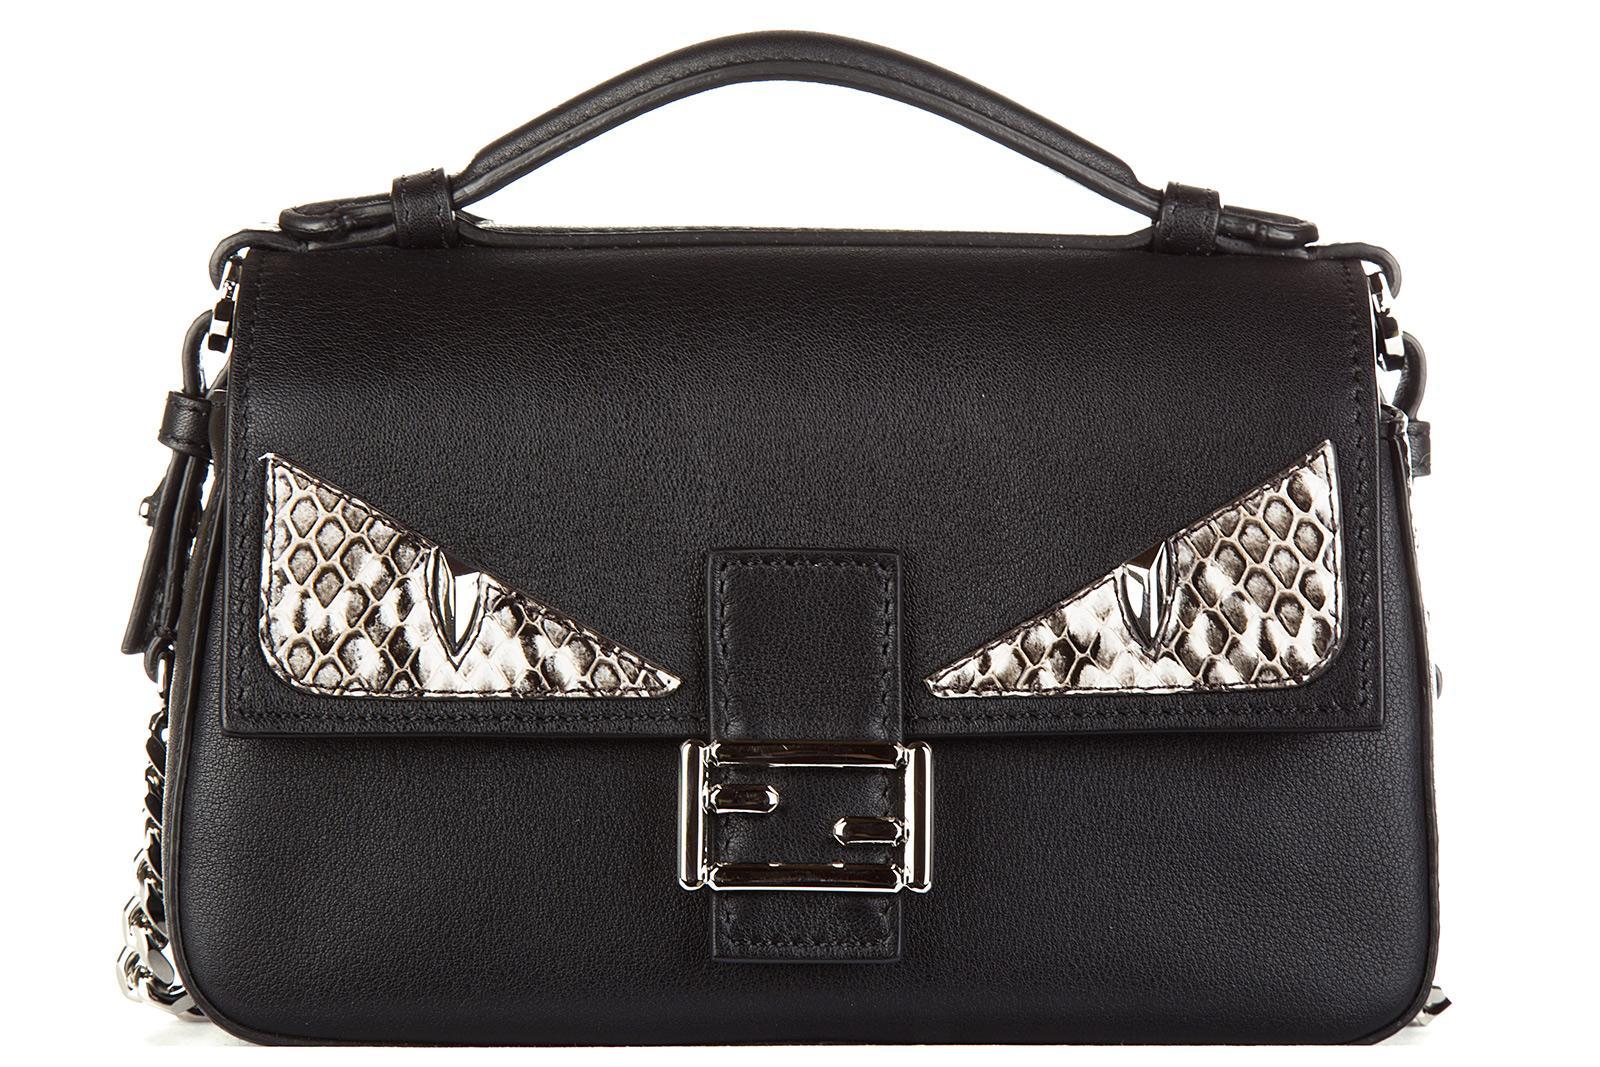 Schultertasche Leder Damen Tasche Umhängetasche Bag Occhi Micro Baguette Occhi Elaphe In Black